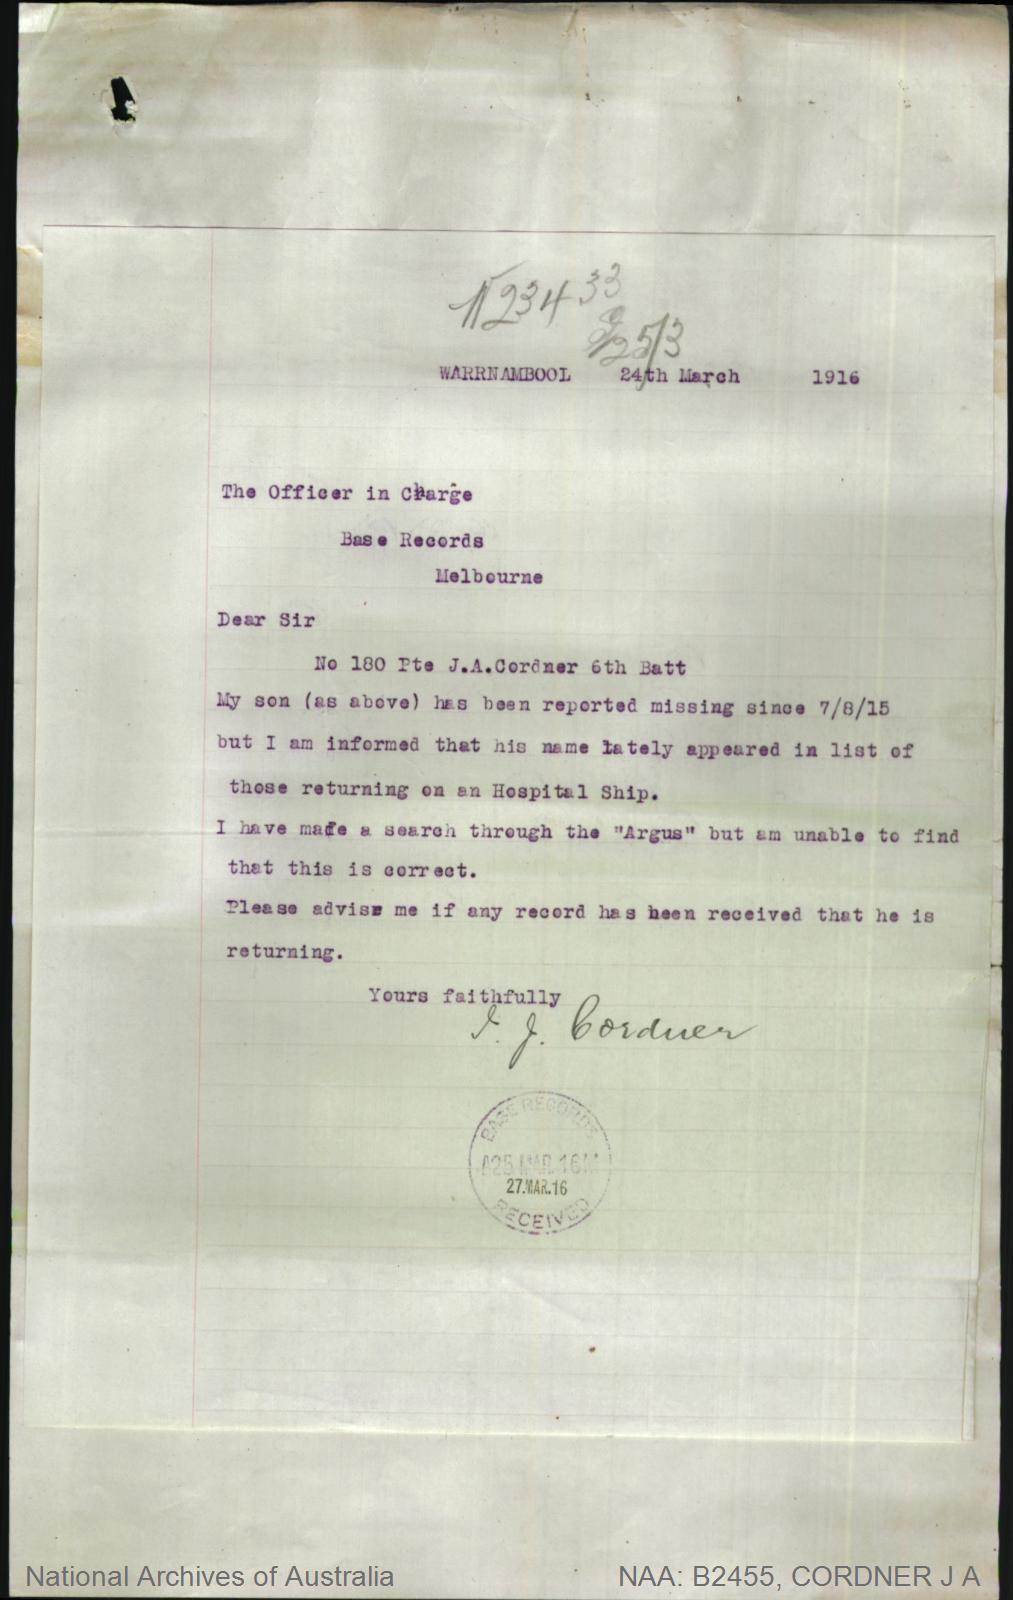 Cordner Joseph Alan : SERN 180 : POB Bridgewater On Loddon VIC : POE Melbourne VIC : NOK F Cordner Joseph